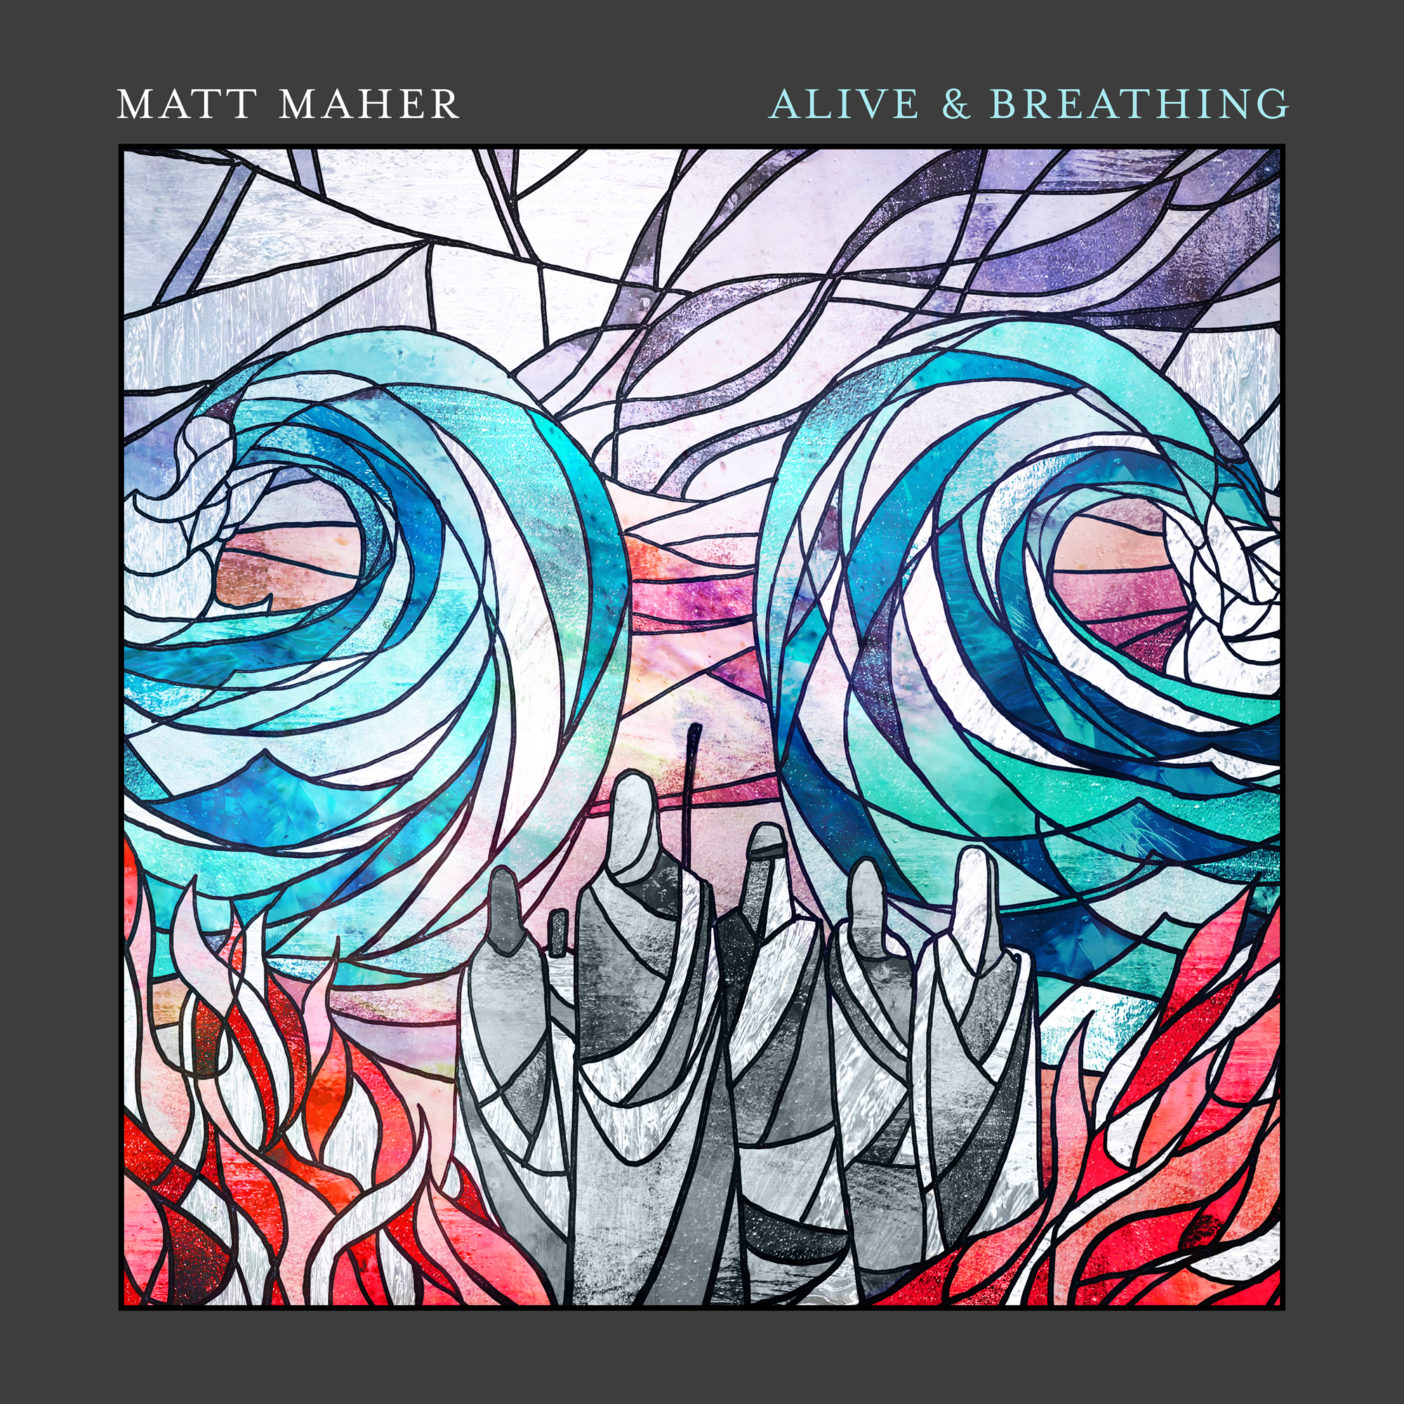 Matt Maher - Alive & Breathing